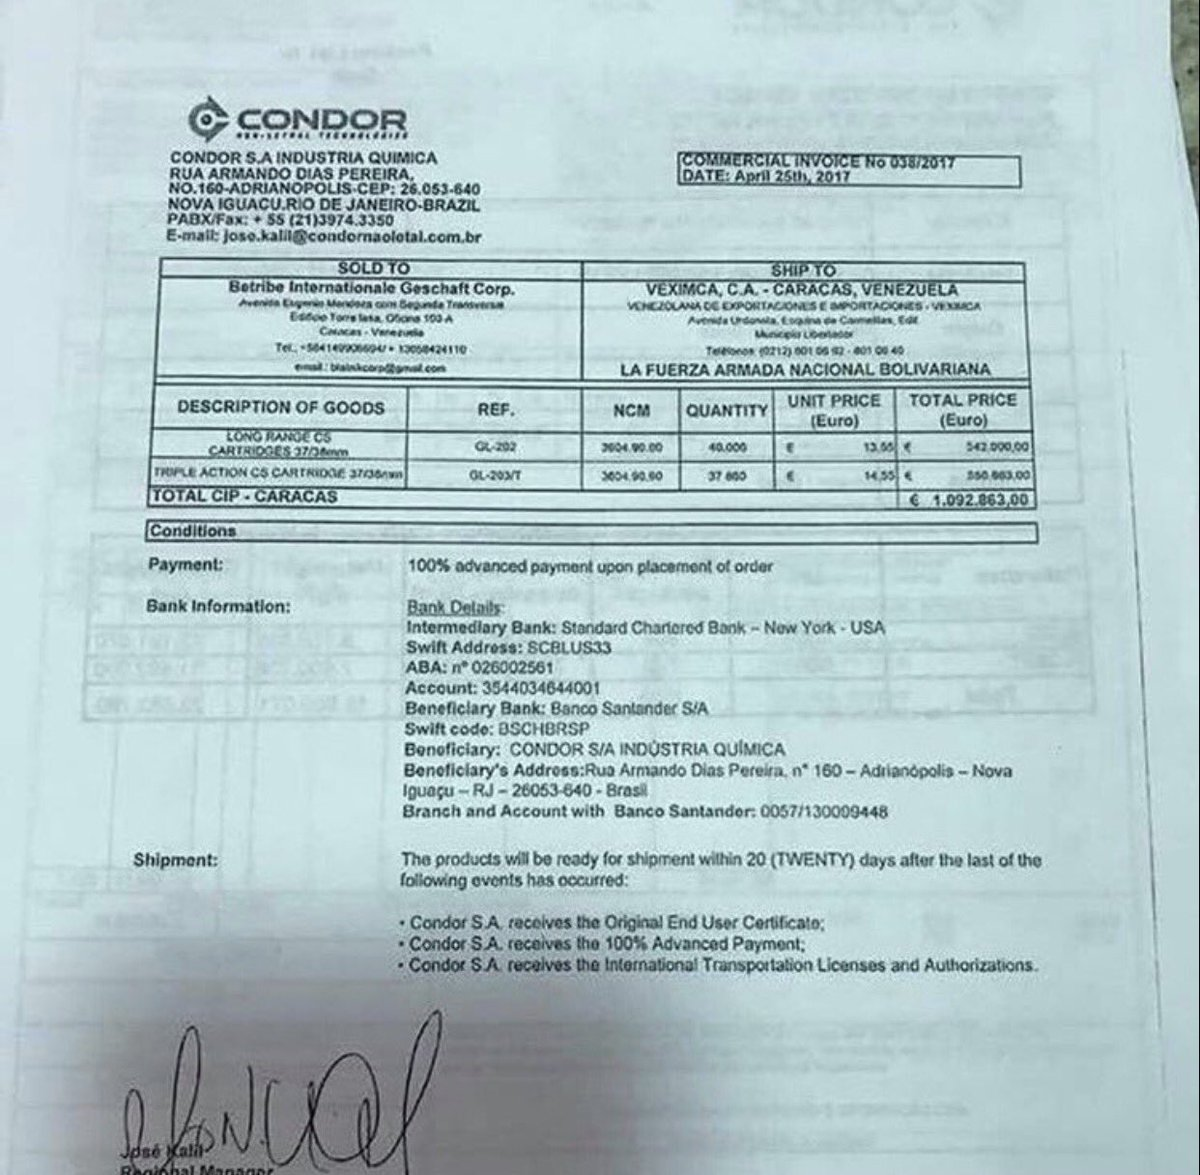 René Rincón On Twitter While Idiots Of Condor Brasil Teargas To Venezuela Dictatorial Regime 1m Euros Aviancabrasil Refuses Transport The